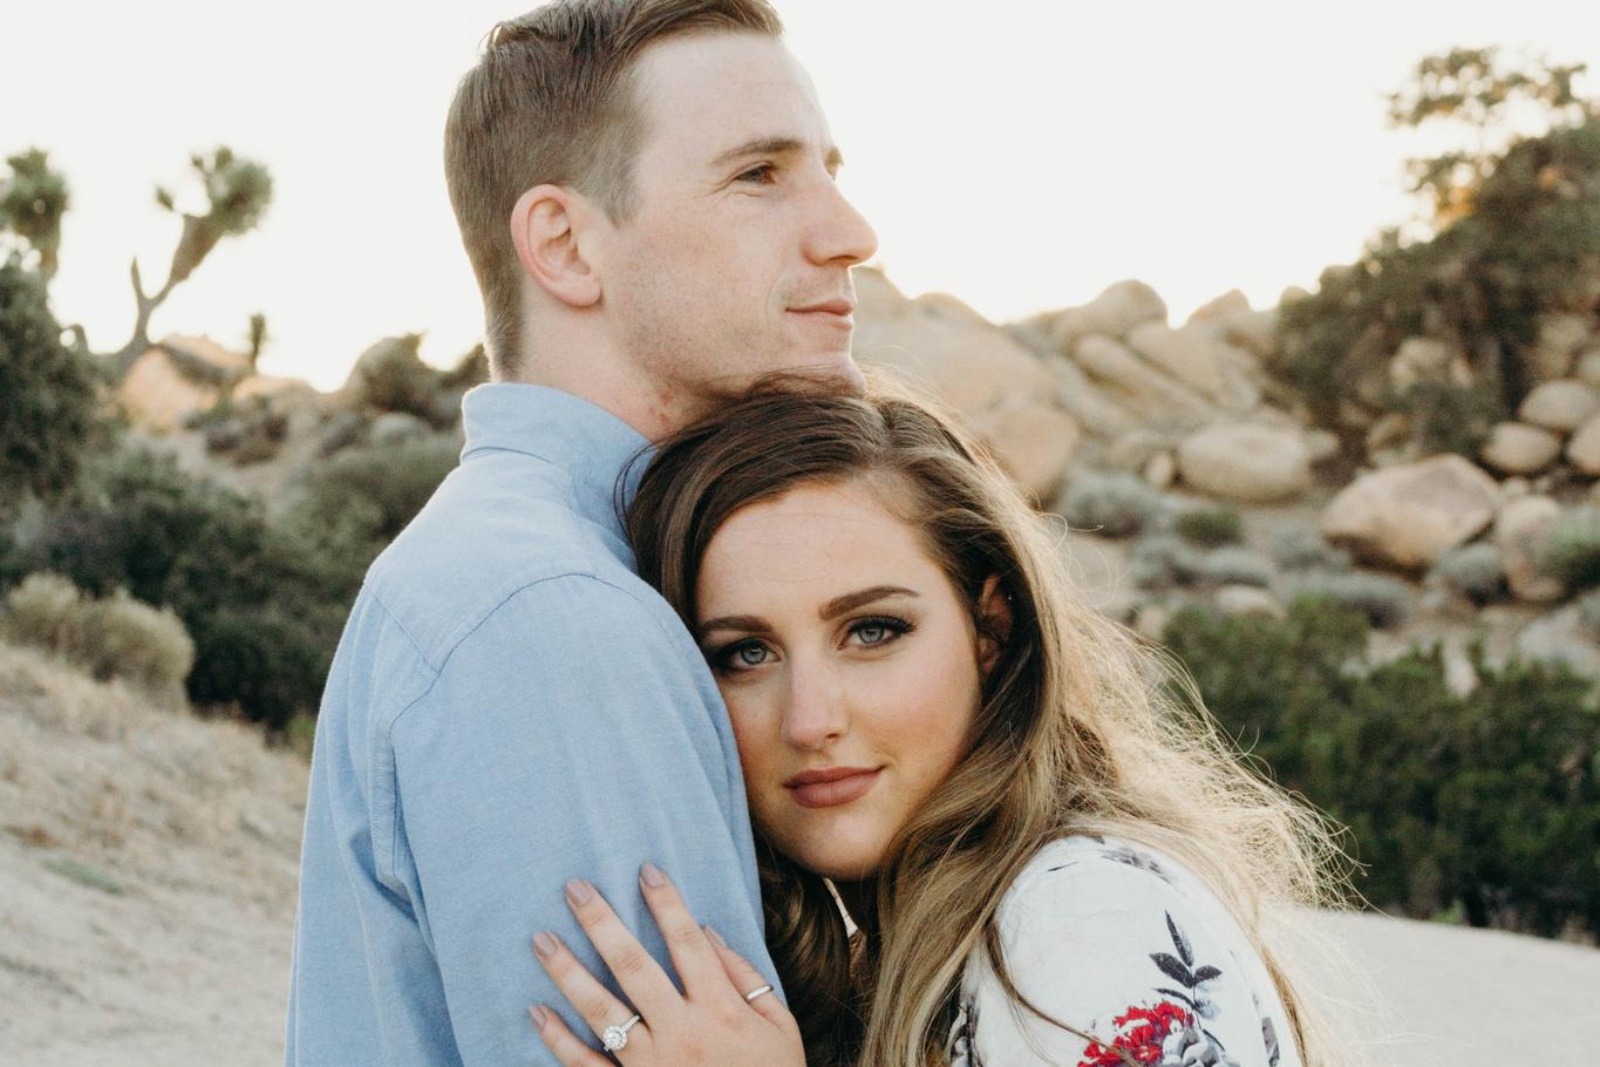 Alexandra Nicole Wing and Justin Ryan Quarress